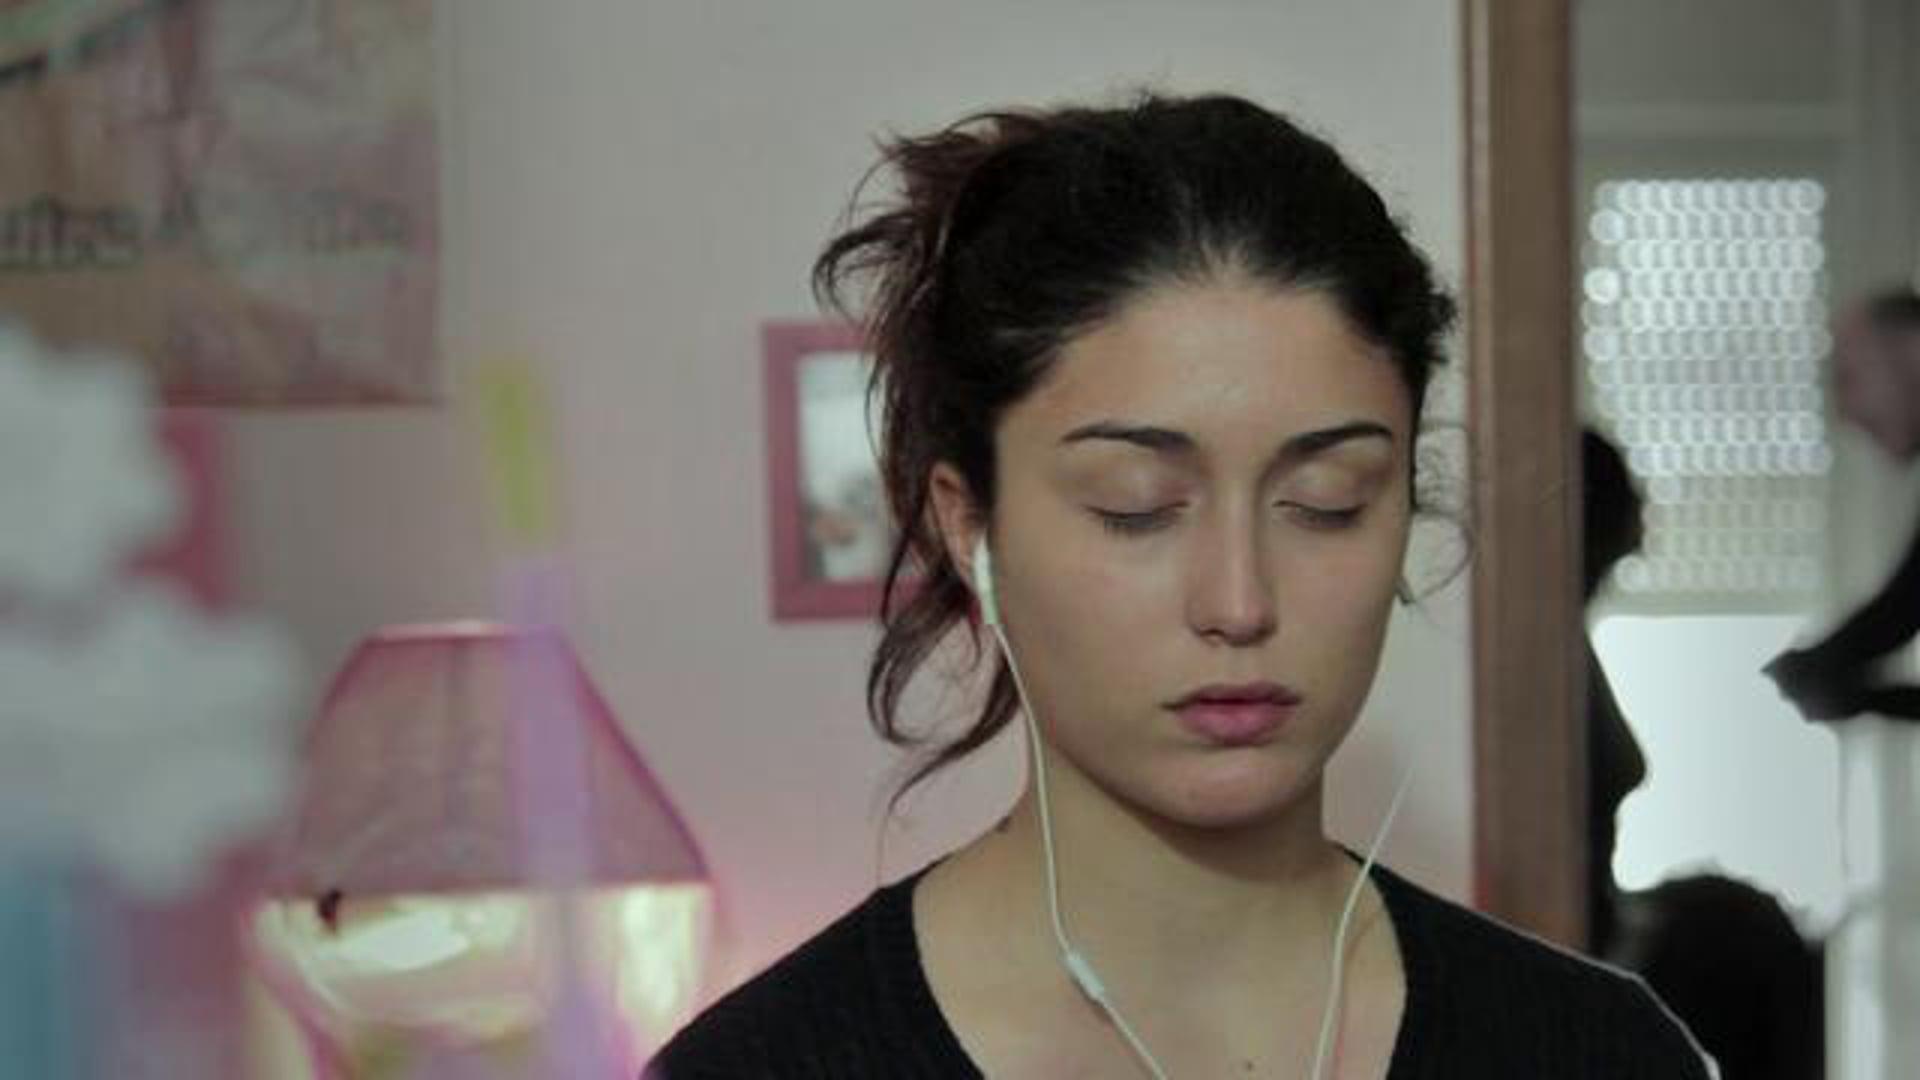 Battiti (Heartbeats) a short film - ENG sub